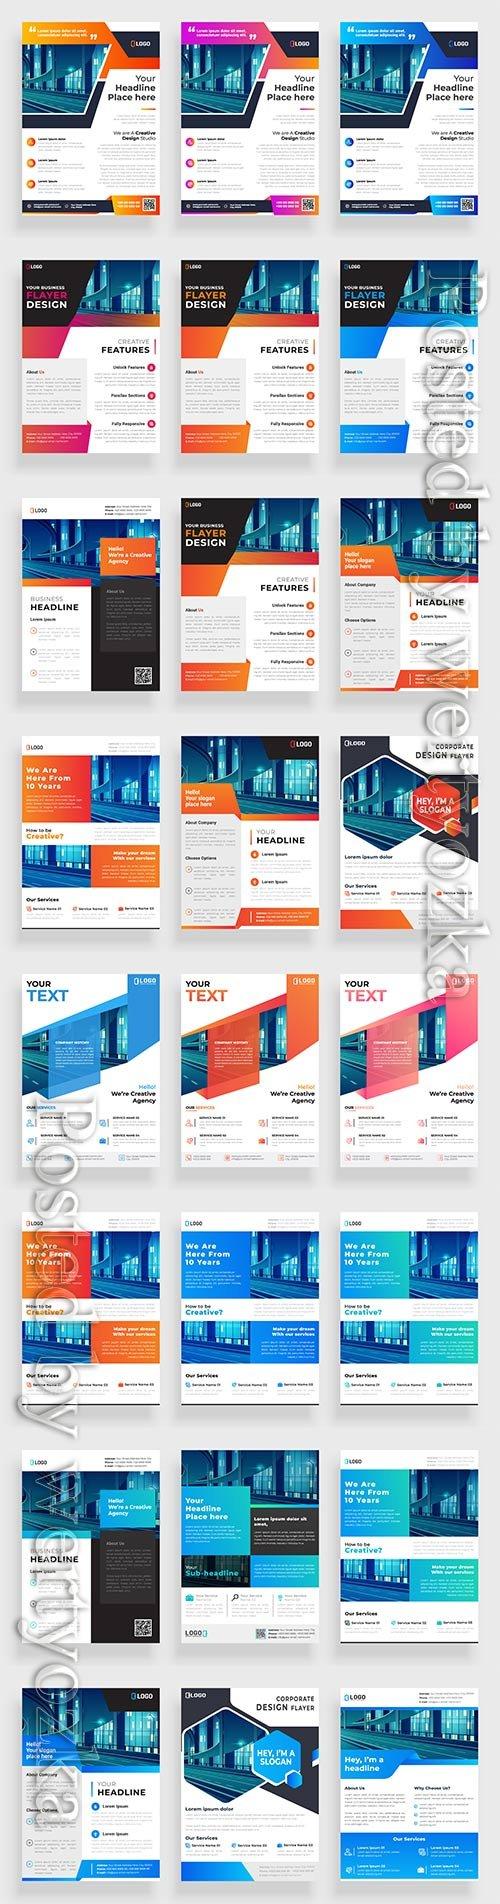 Business flyer template design, brochure vector illustration # 7